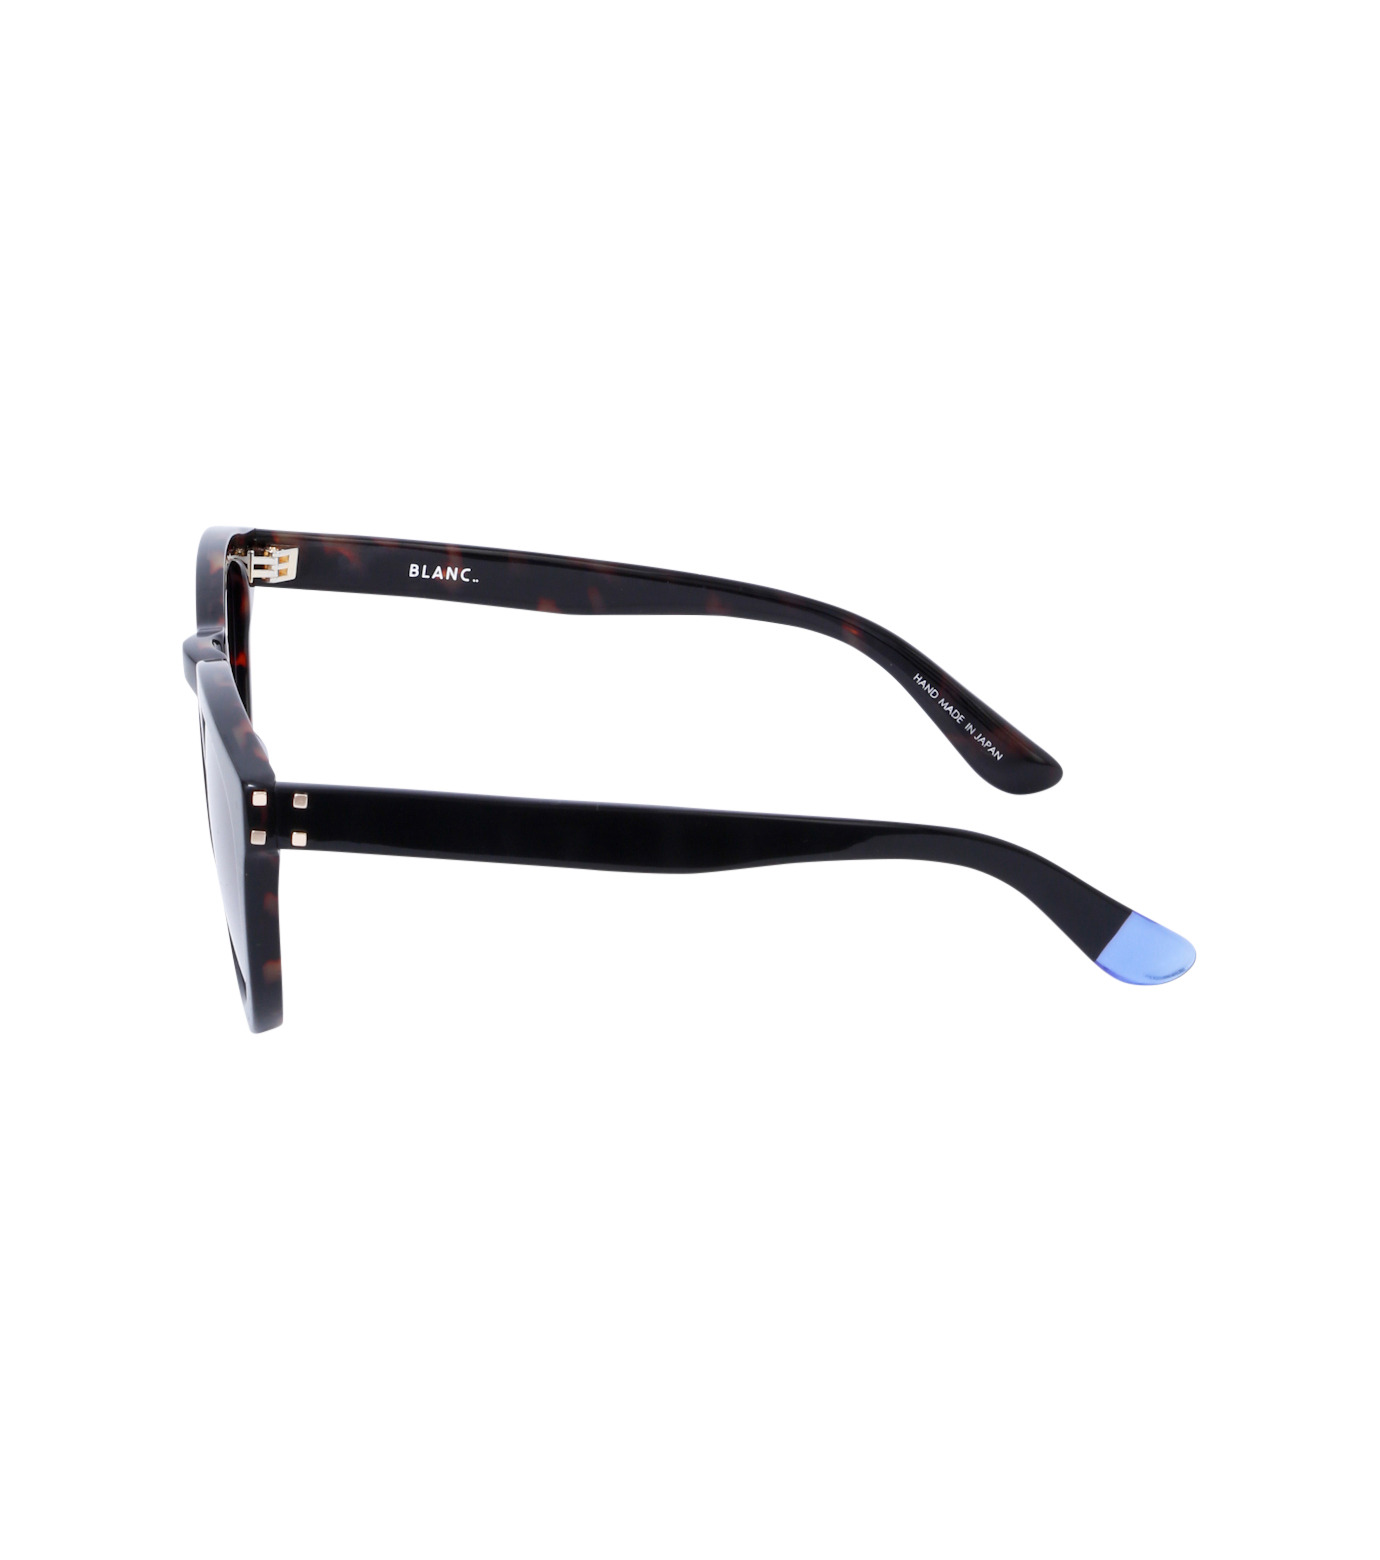 BLANC(ブラン)のThick Frame Sunglass-BLACK(アイウェア/eyewear)-B0007-N-13 拡大詳細画像2